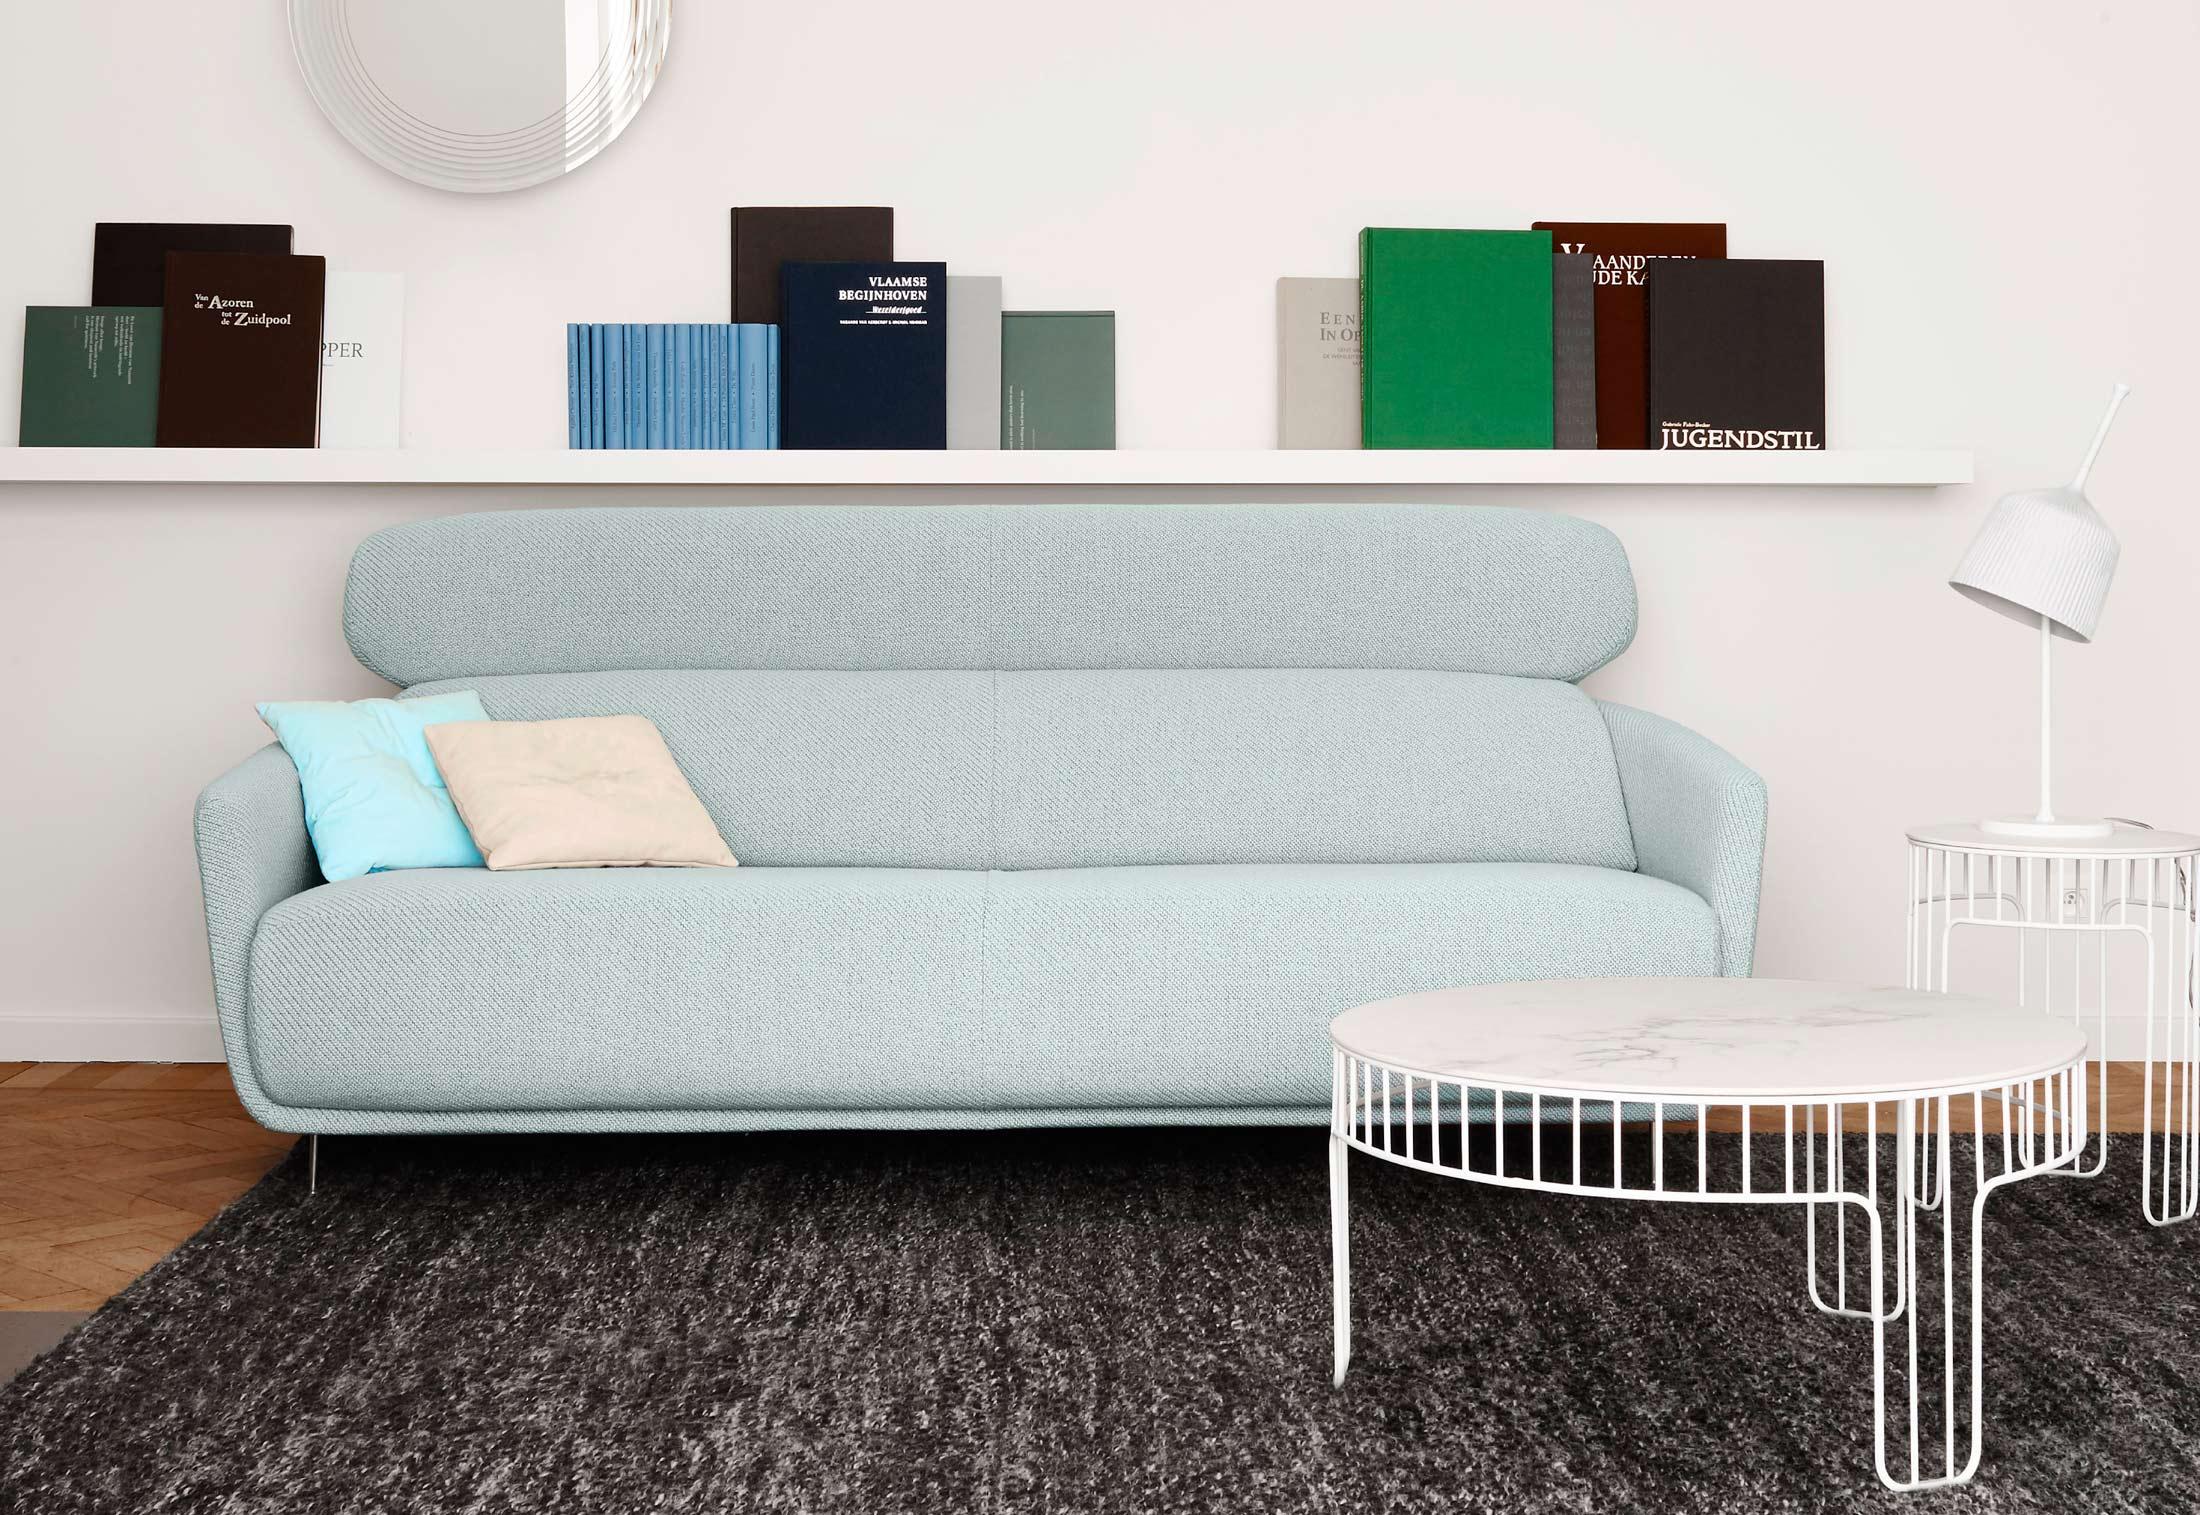 okura 2 sitzer hohe lehne von ligne roset stylepark. Black Bedroom Furniture Sets. Home Design Ideas